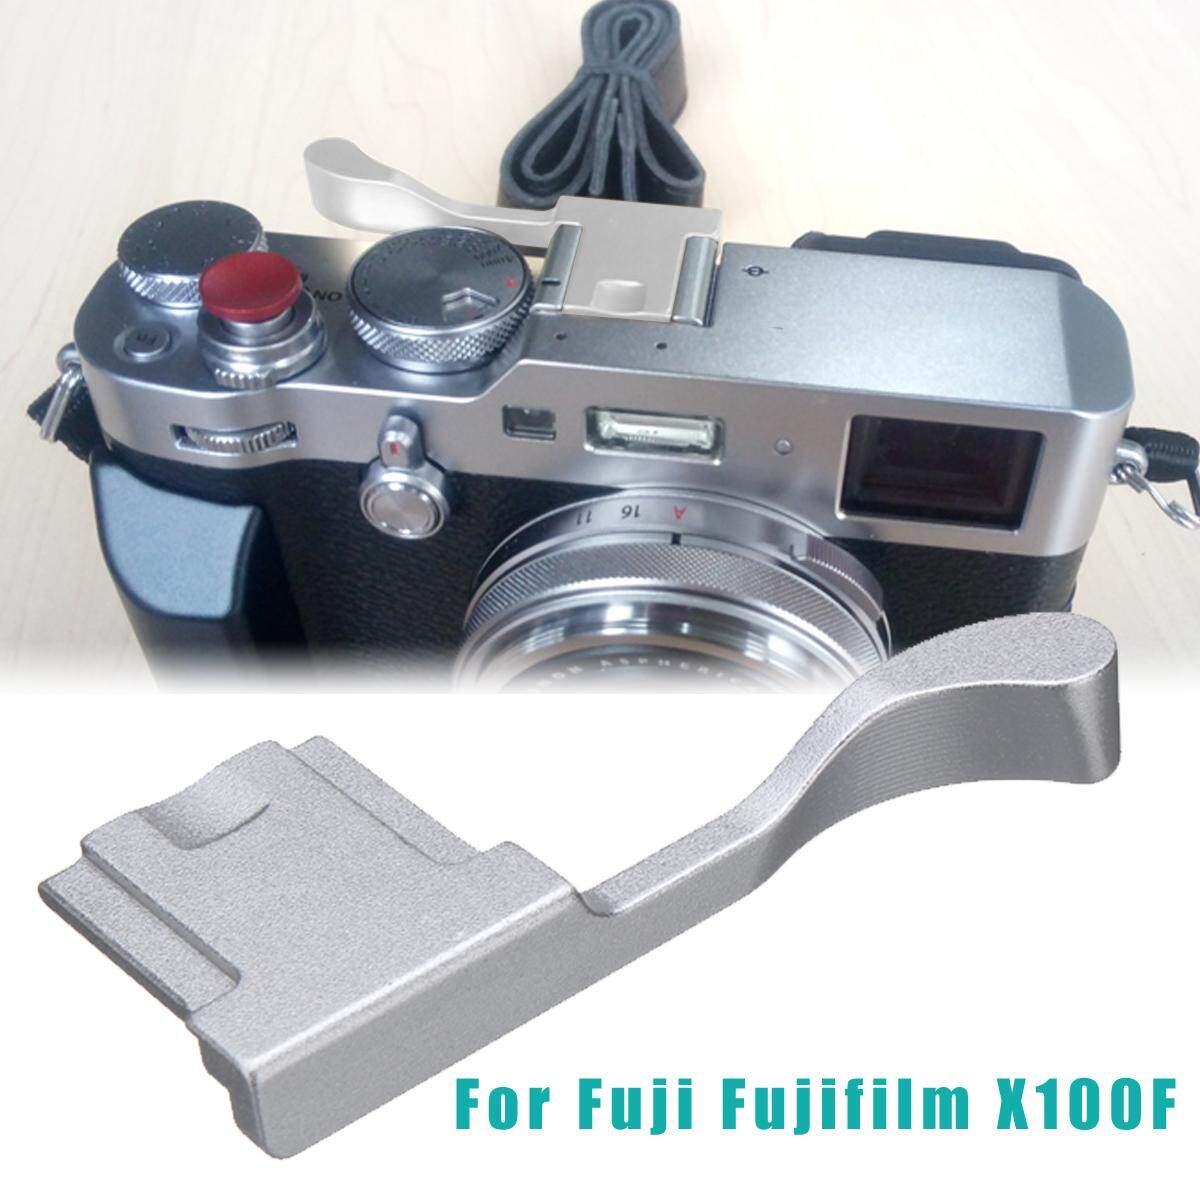 Bantalan Jempol Grip Menggantikan UNTUK Fuji Fujifilm X100F Mirrorless Digital Camera-Intl